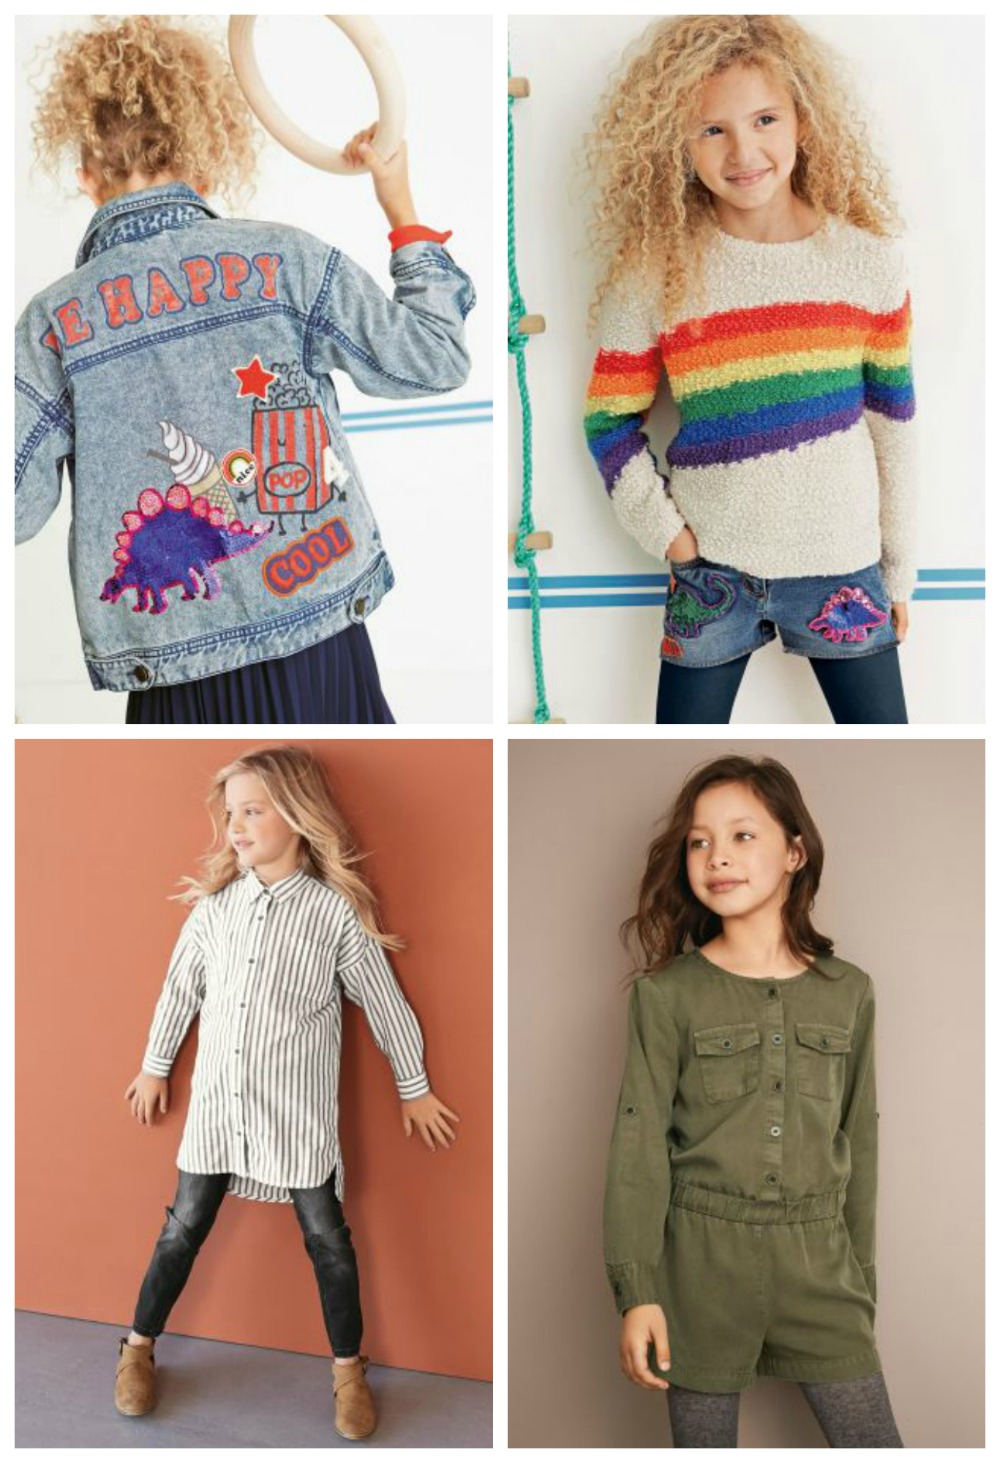 NEXT clothes for tweens